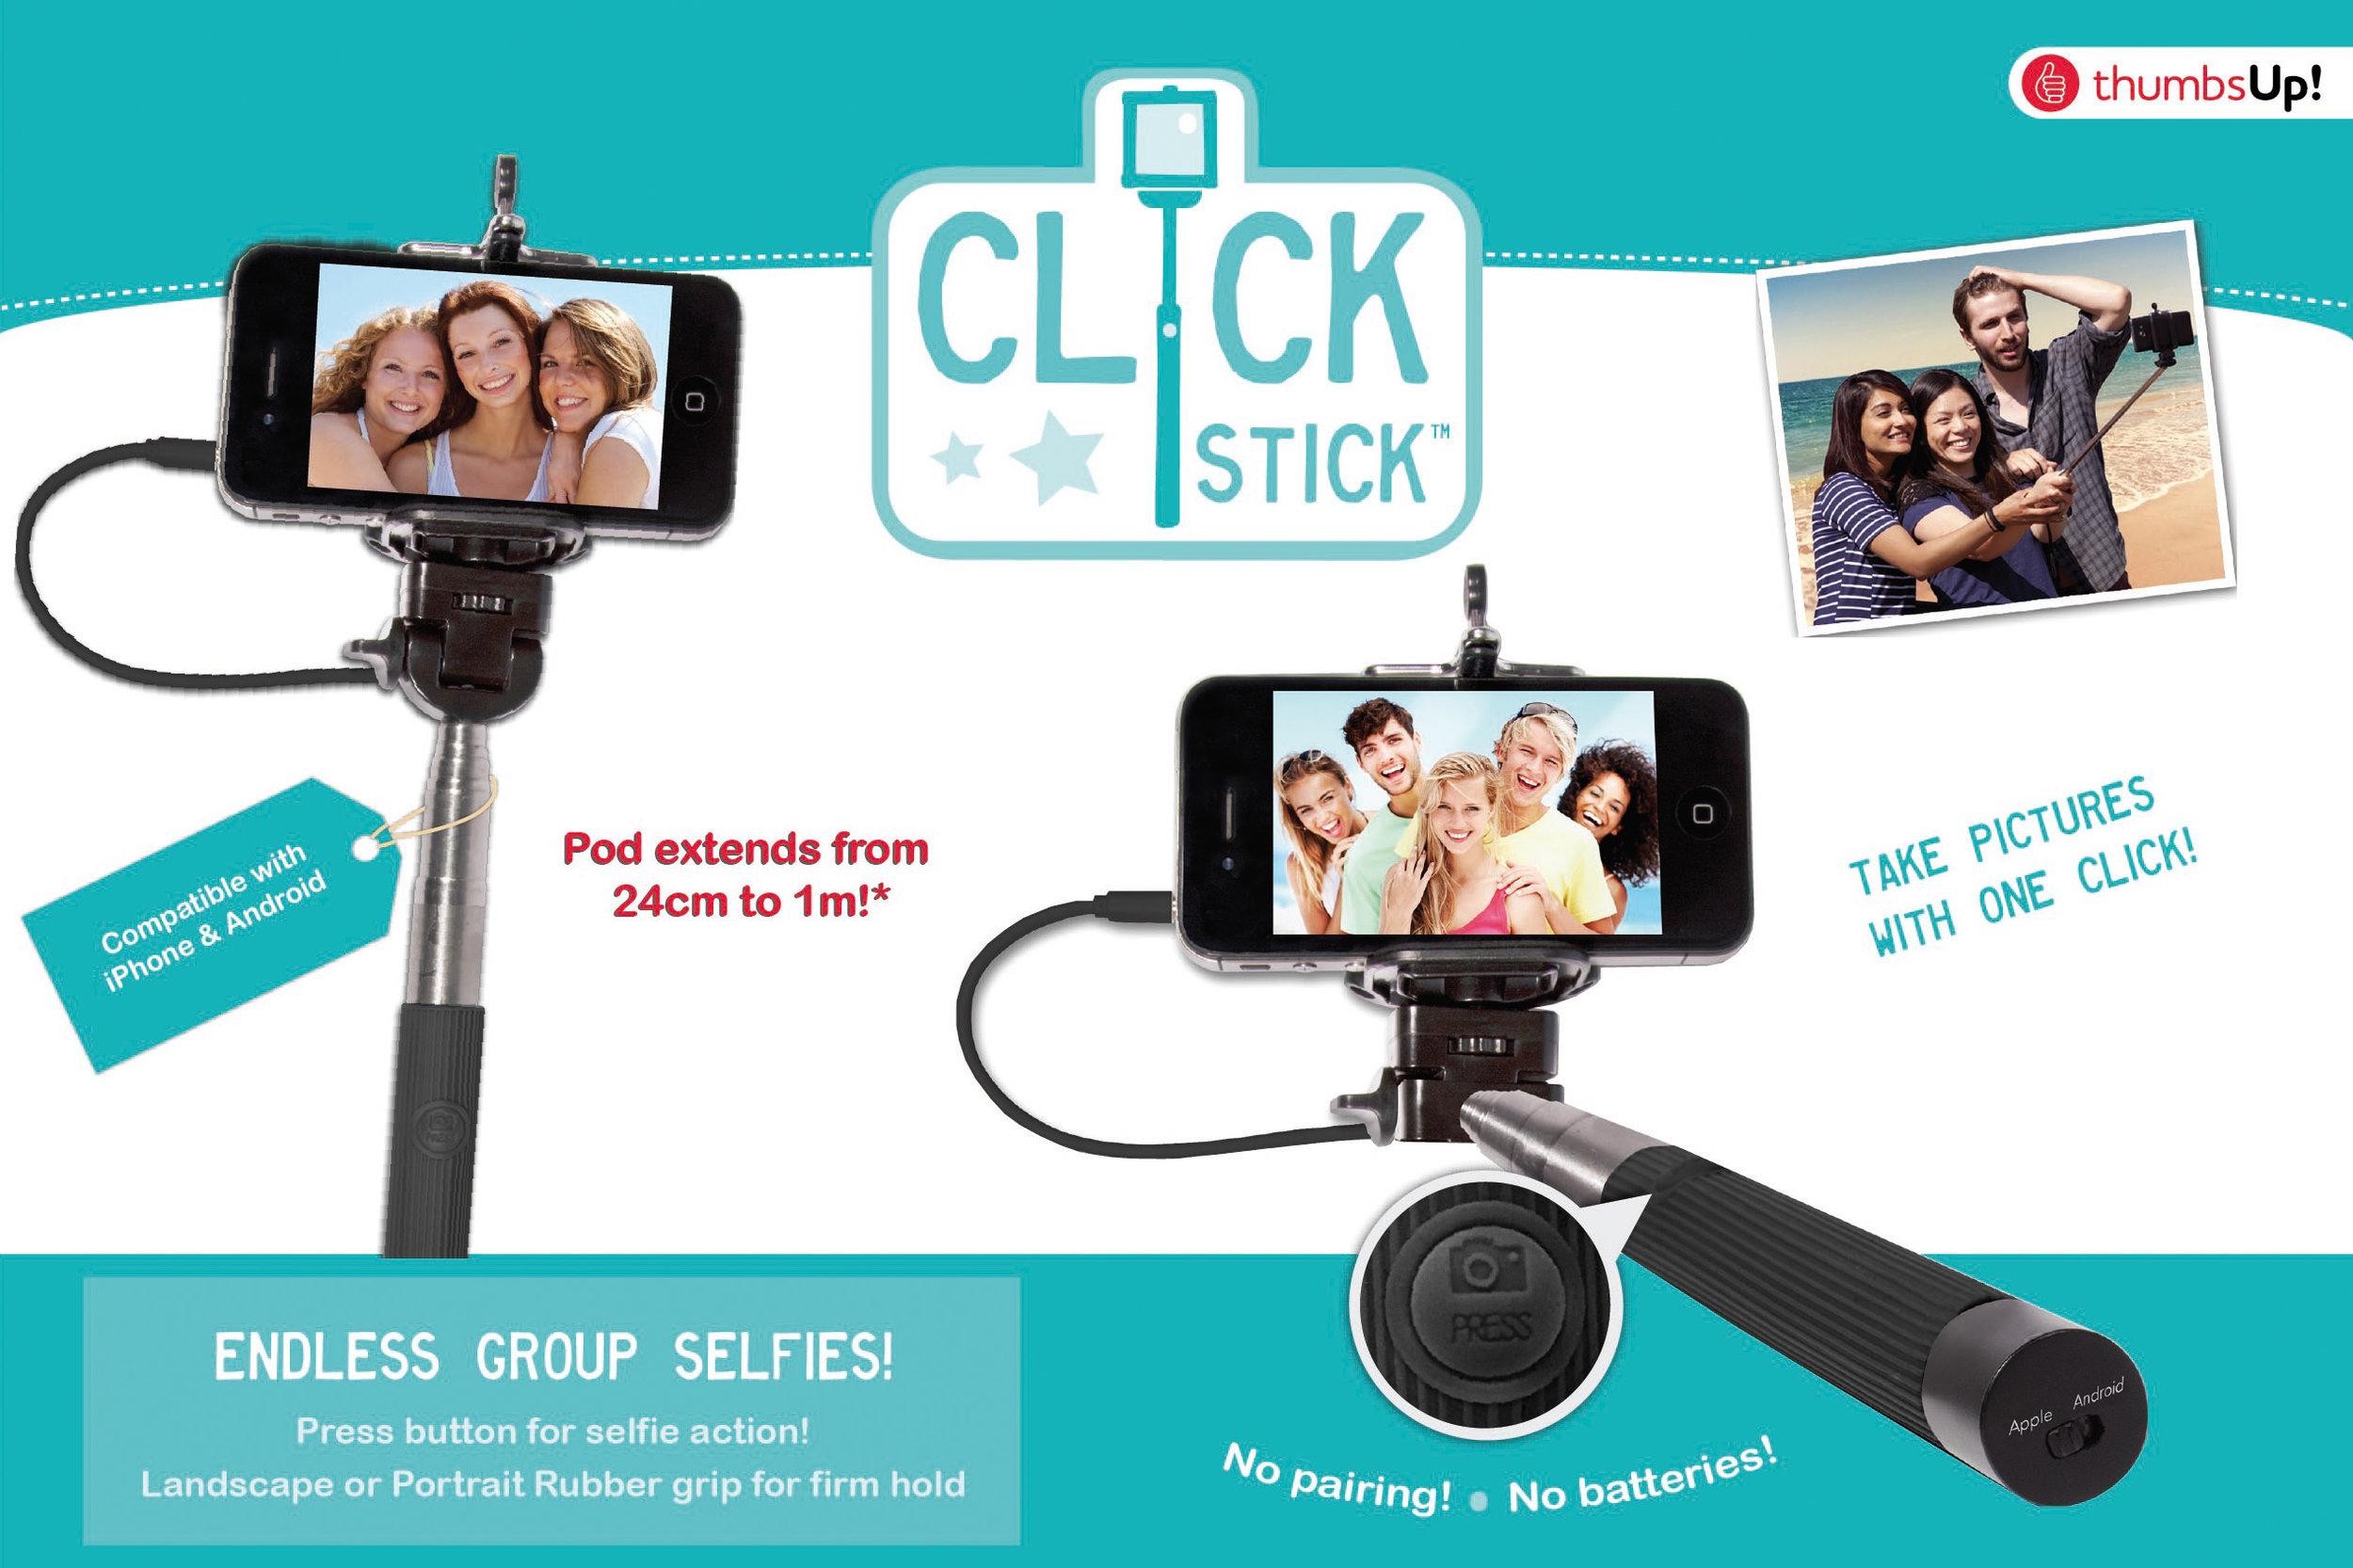 thumbs-up-click-selfie-stick-electronics_scorpio-worldwide_travel-retail-distributor